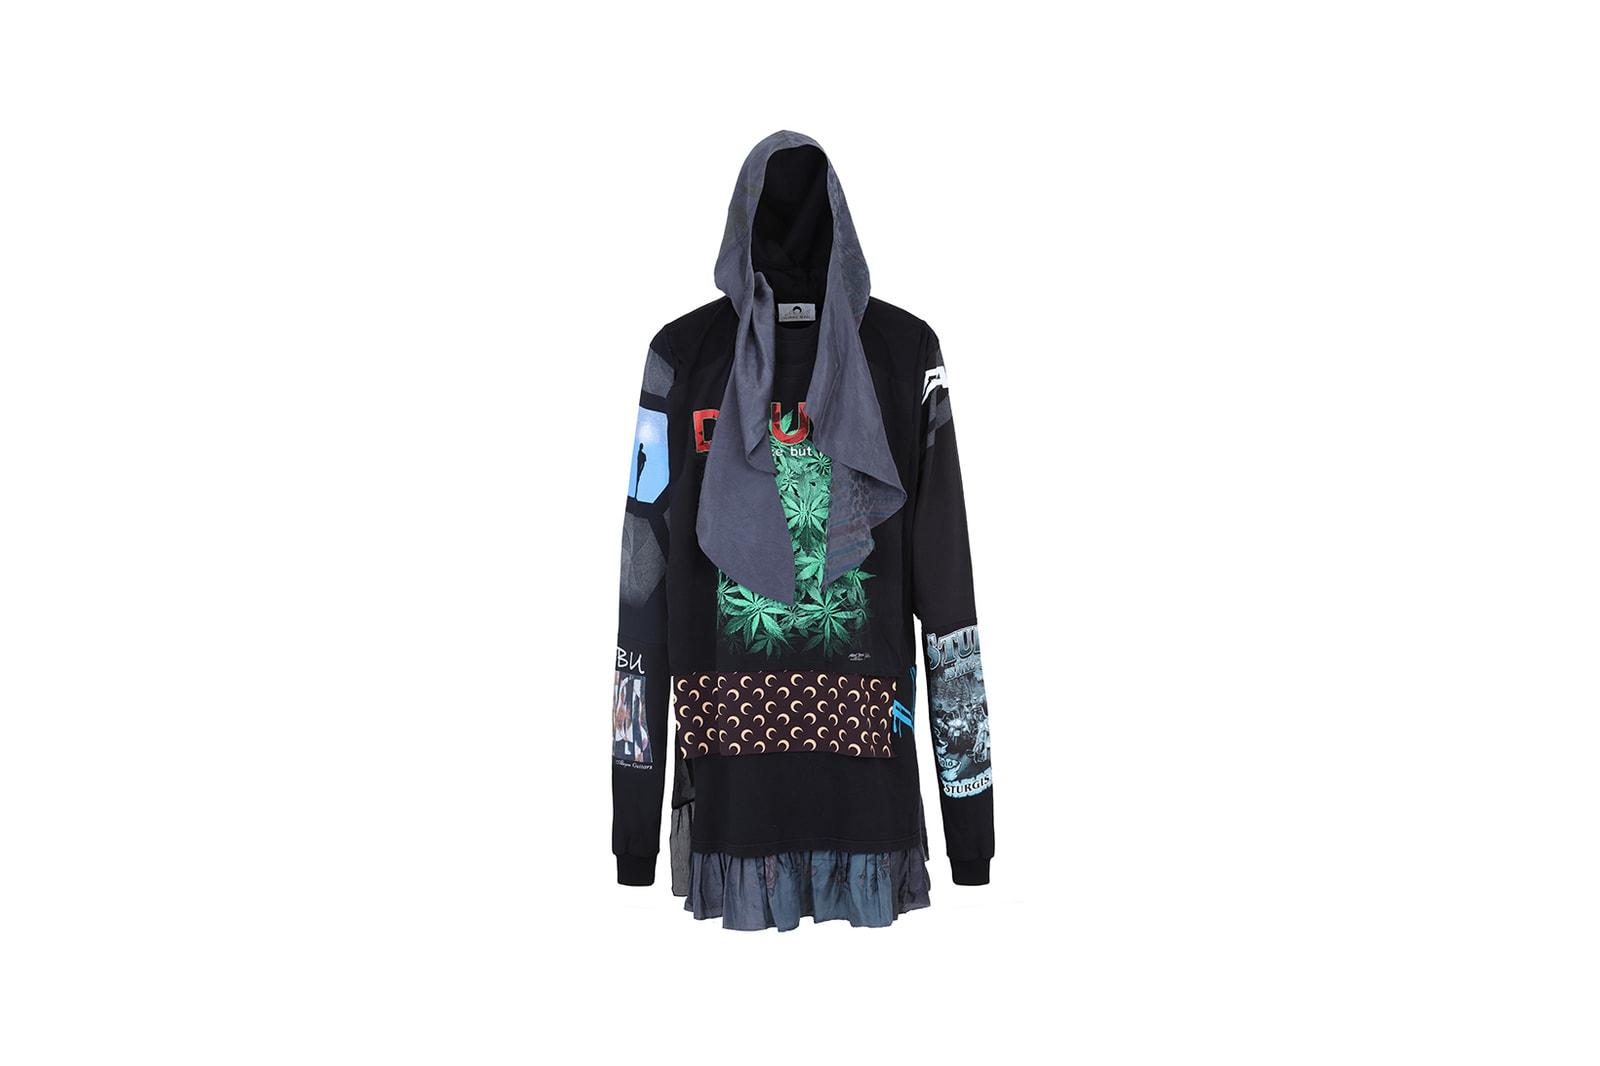 ASAP Rocky AWGE x Marine Serre Collaboration Collection Denim Jacket Crescent Moon